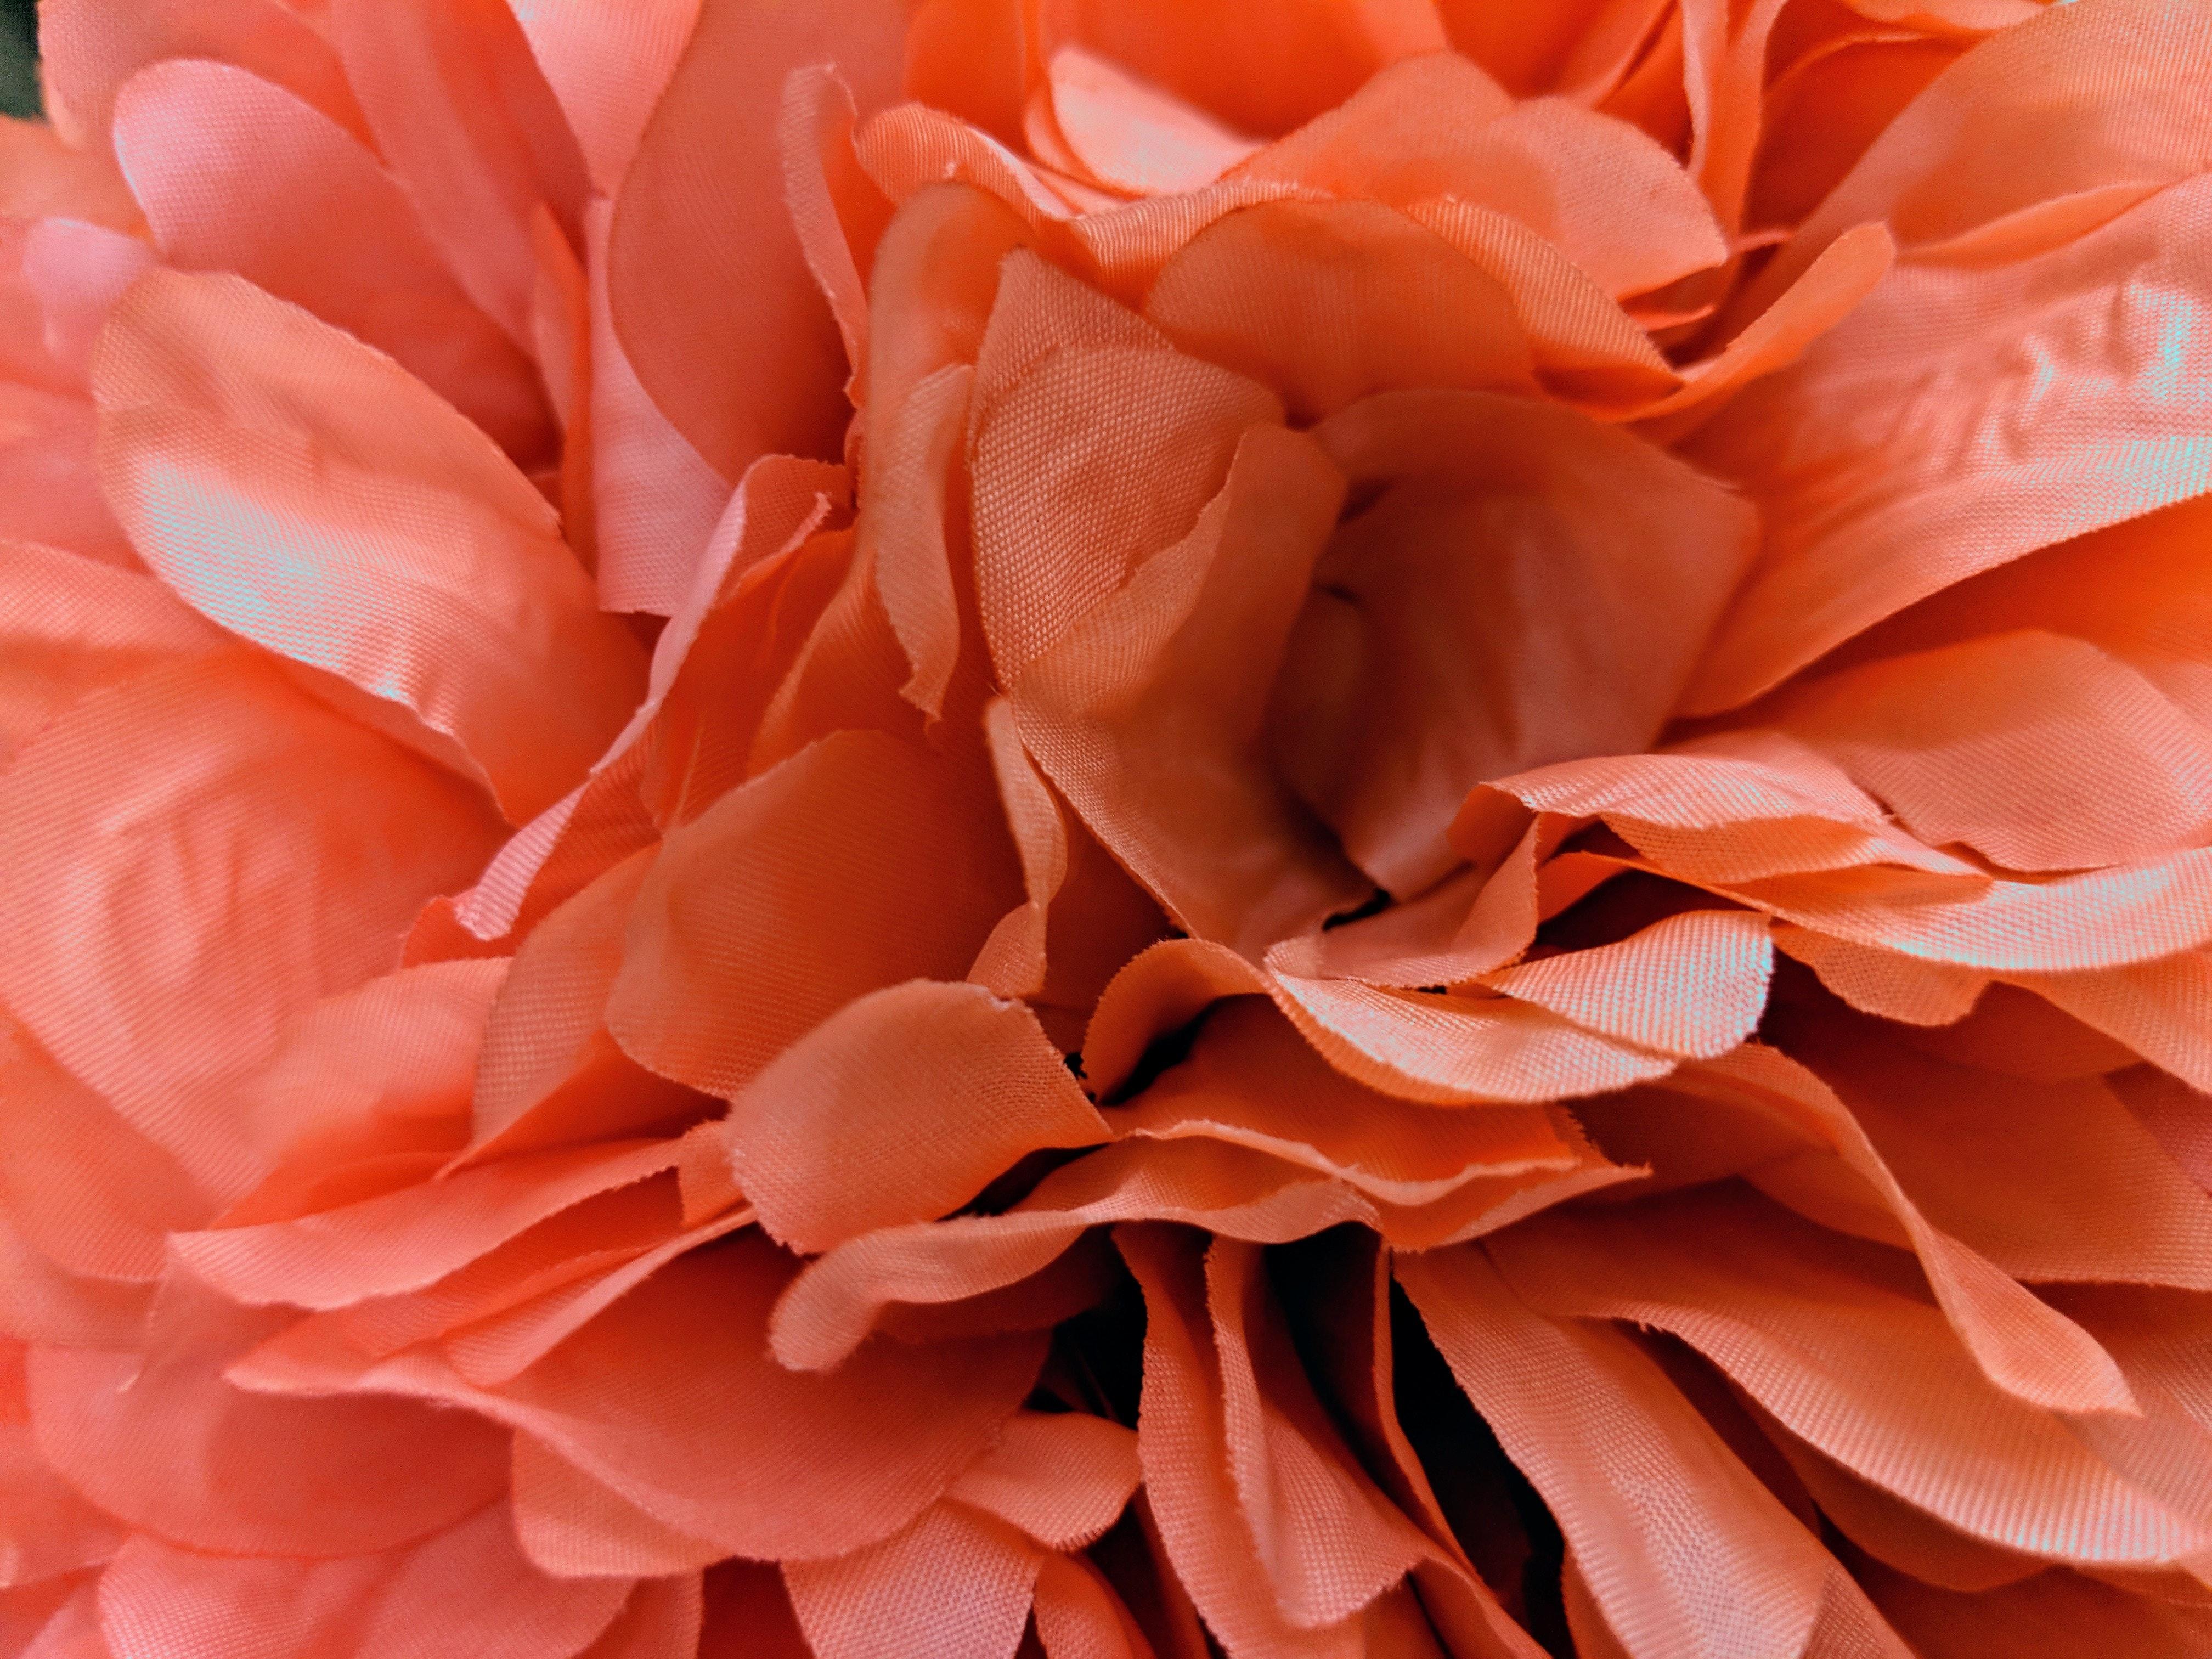 Free stock photo of close up flower, close up petals, flower art